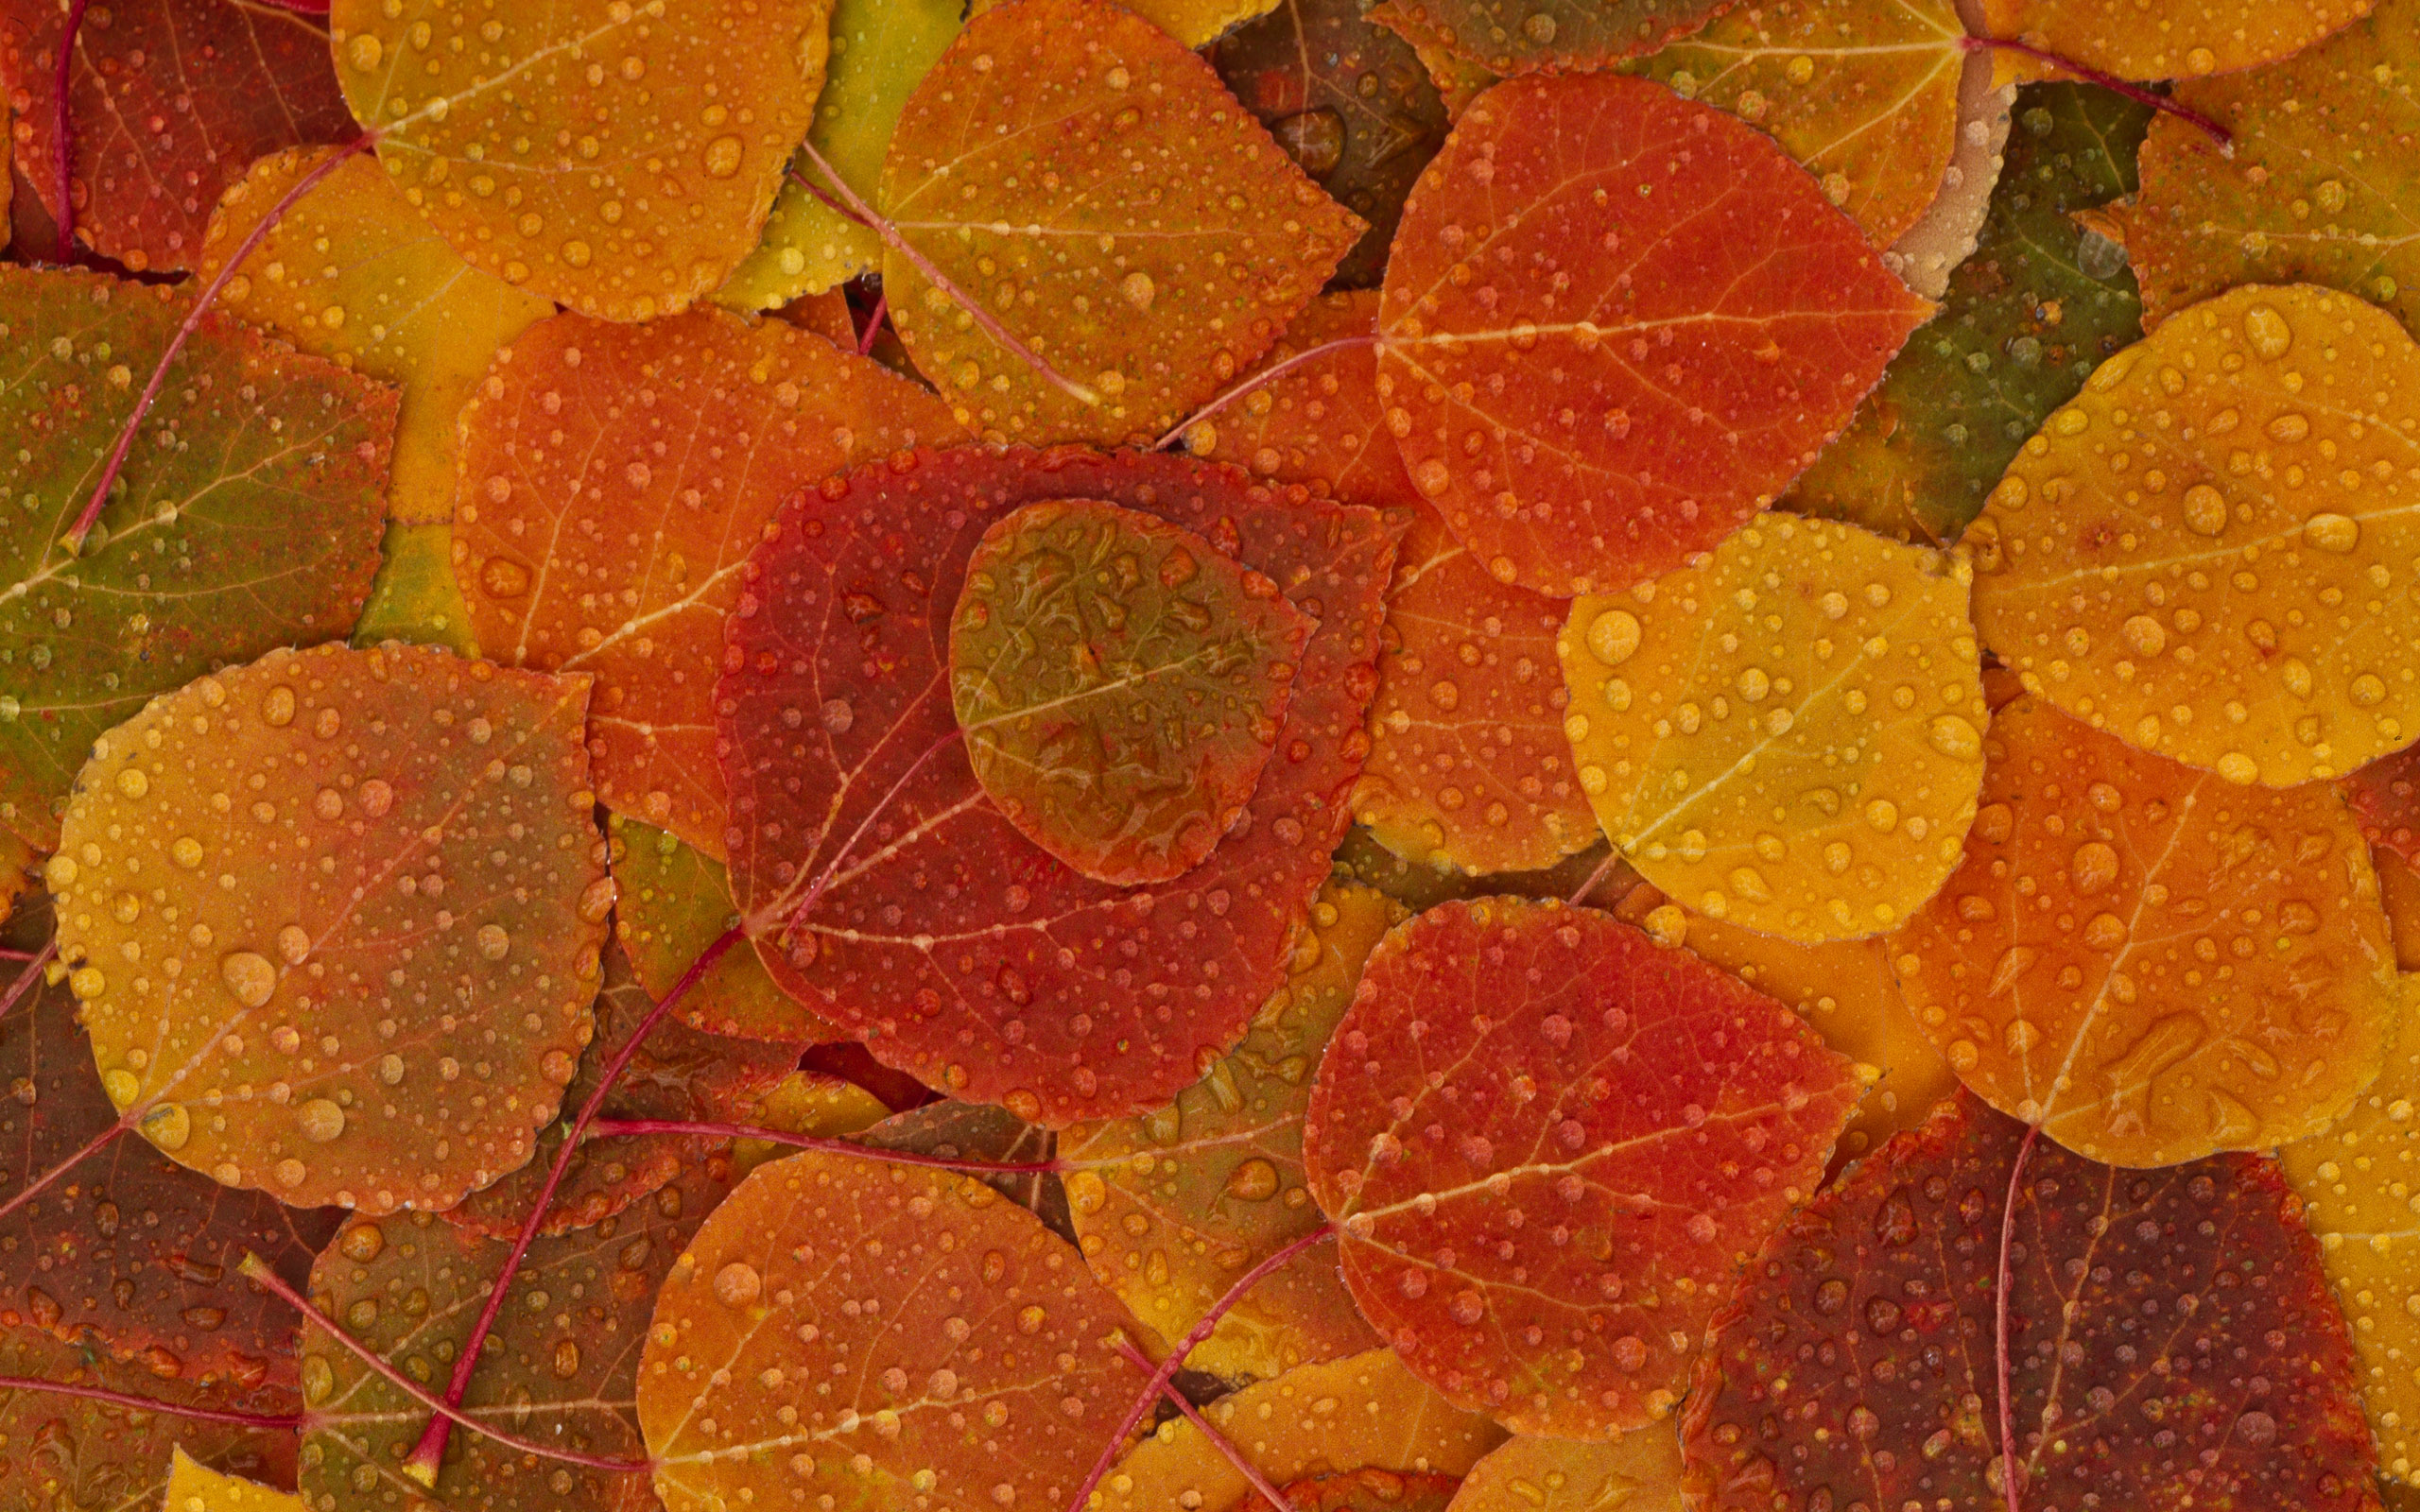 wallpaperstocknetfall leaves wallpapers 14804 2560x1600 1html 2560x1600